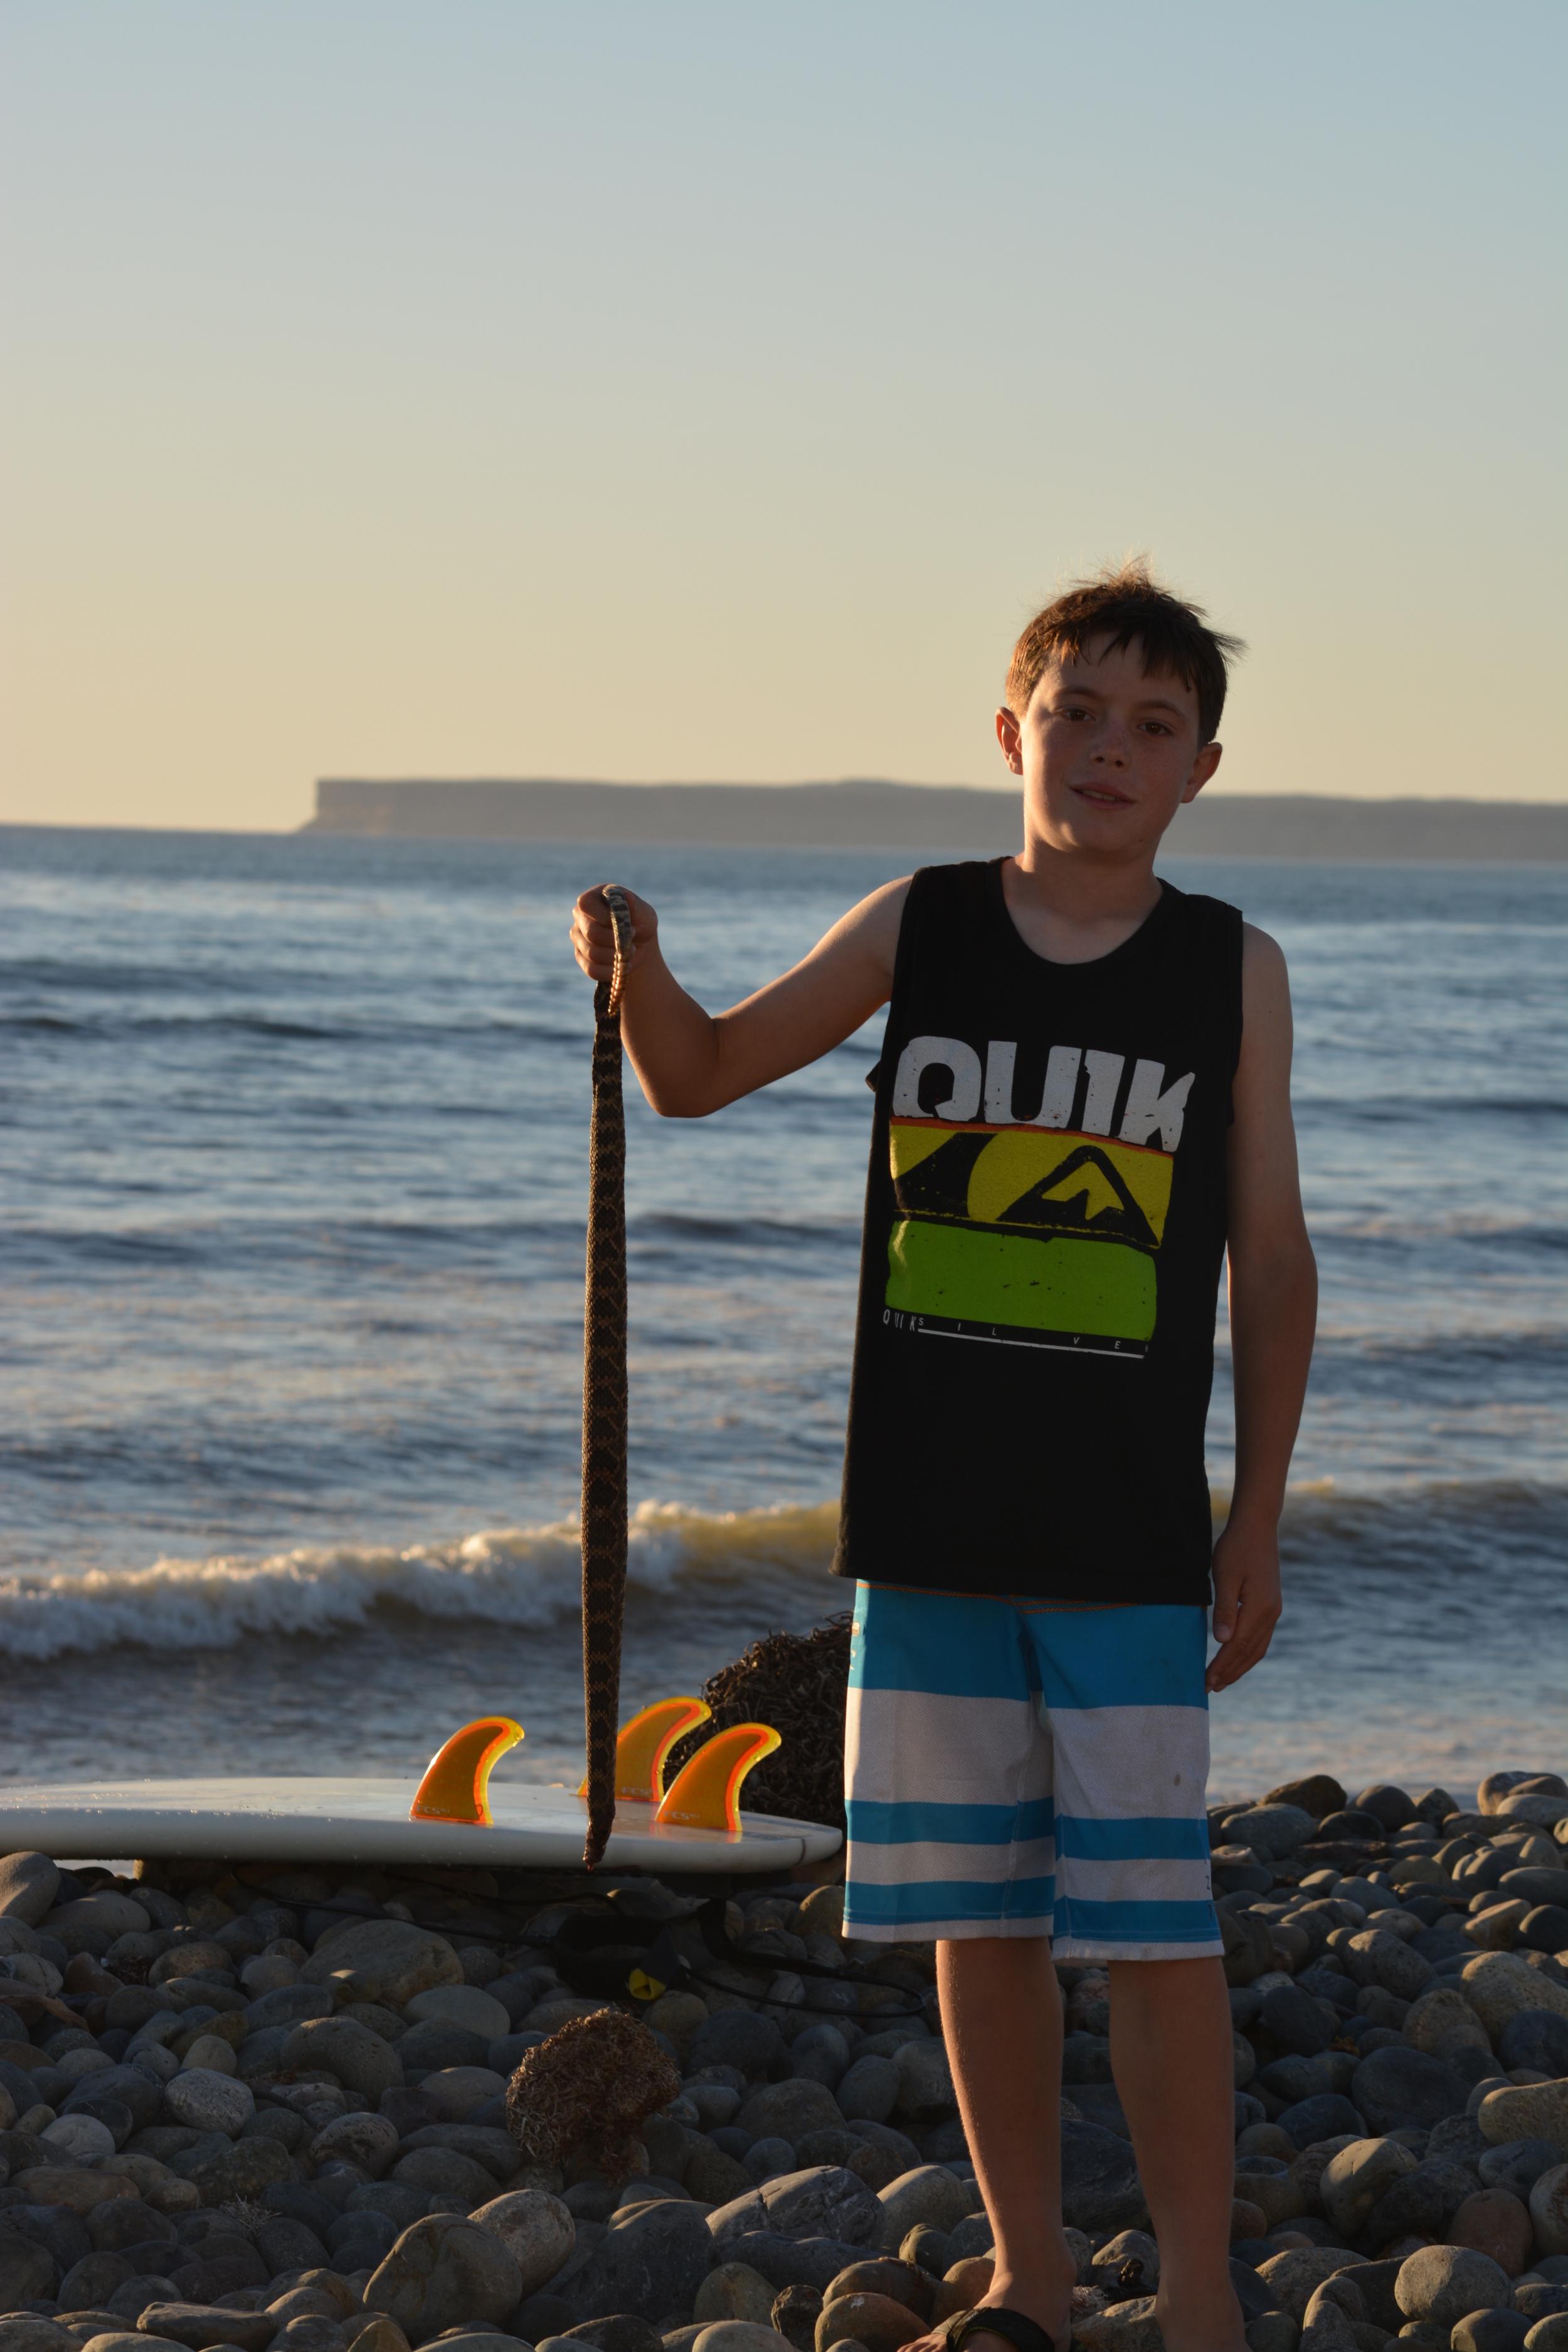 Baja California 10-5-13 Shipwrecks Surfing Adventure Ocean Experience Surf School San Diego (109).JPG